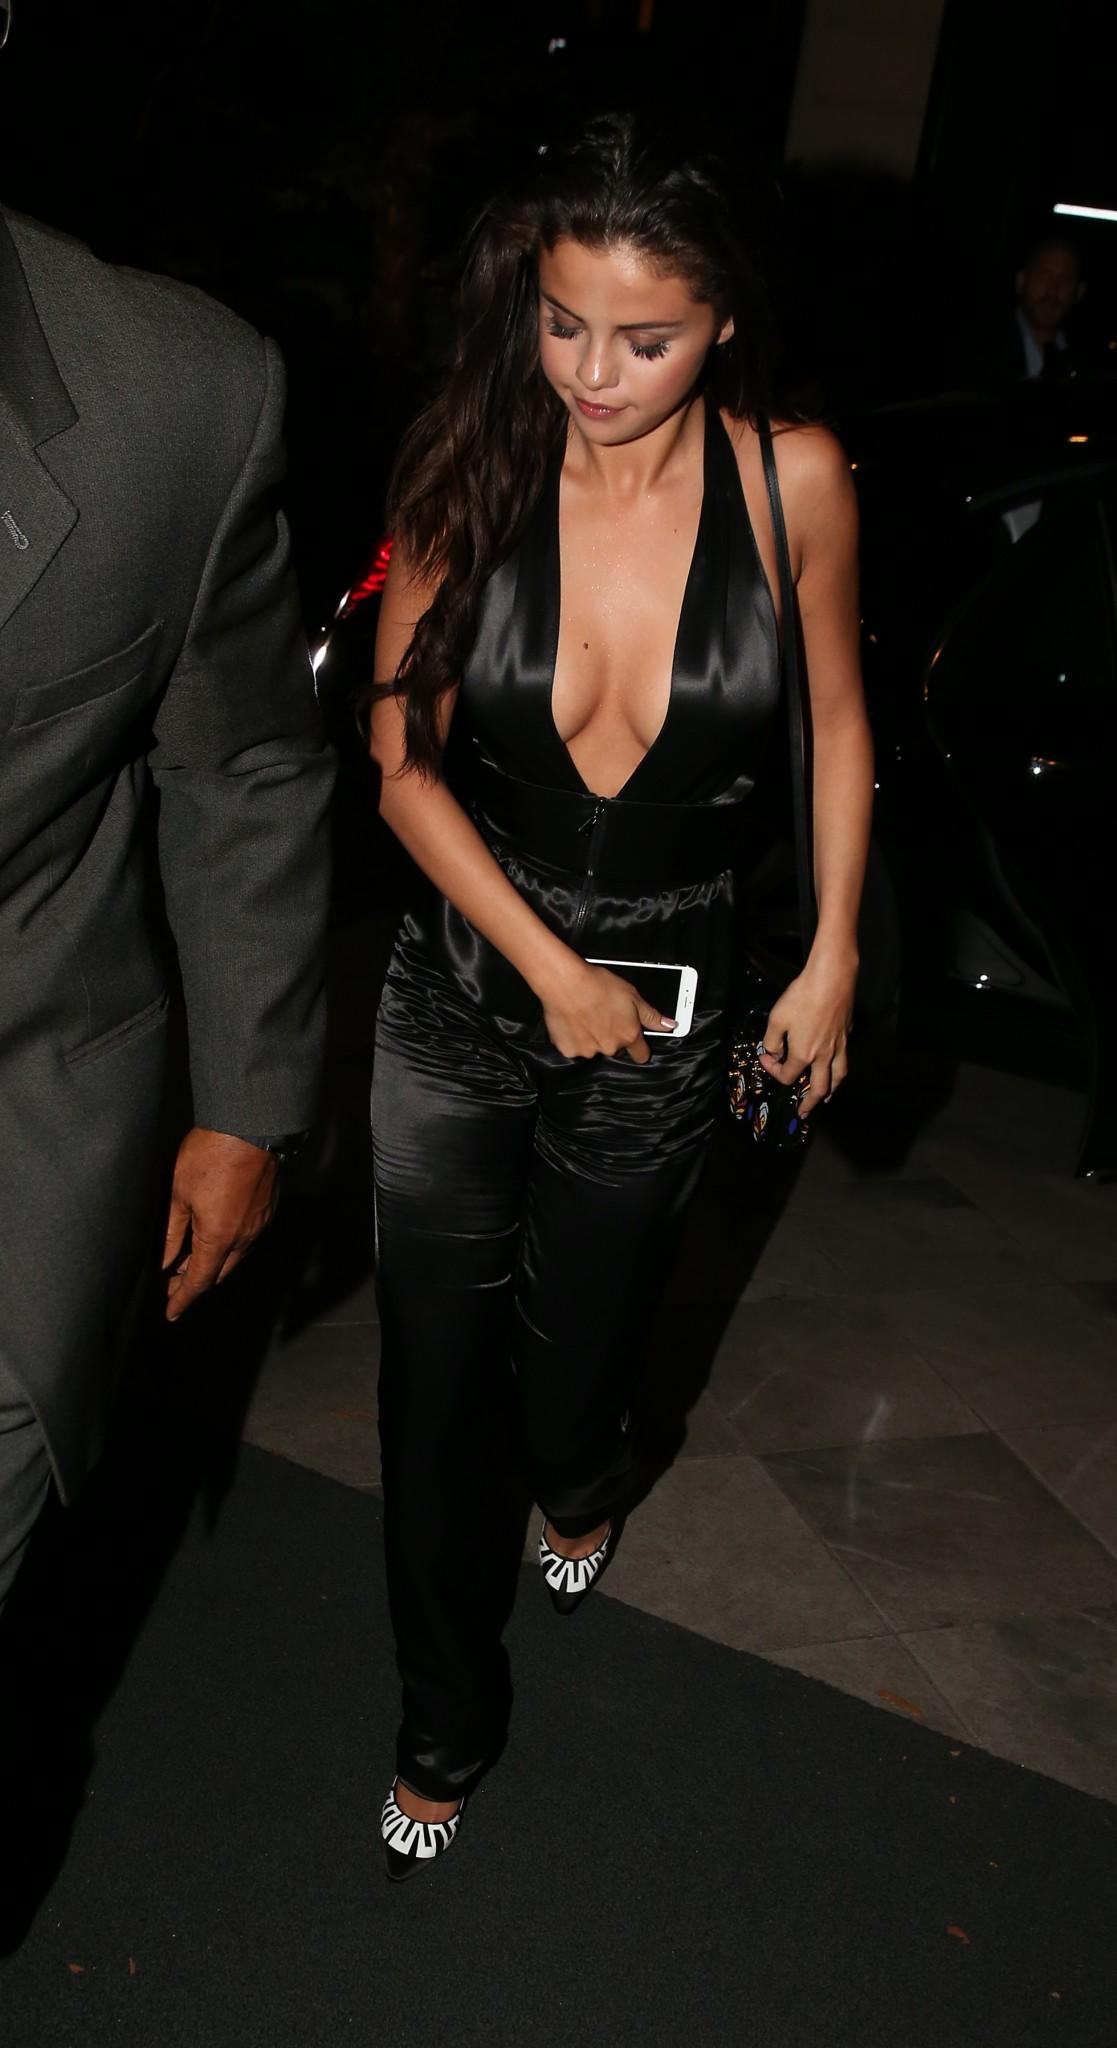 selena gomez cleavage and some pokies in paris celebrity